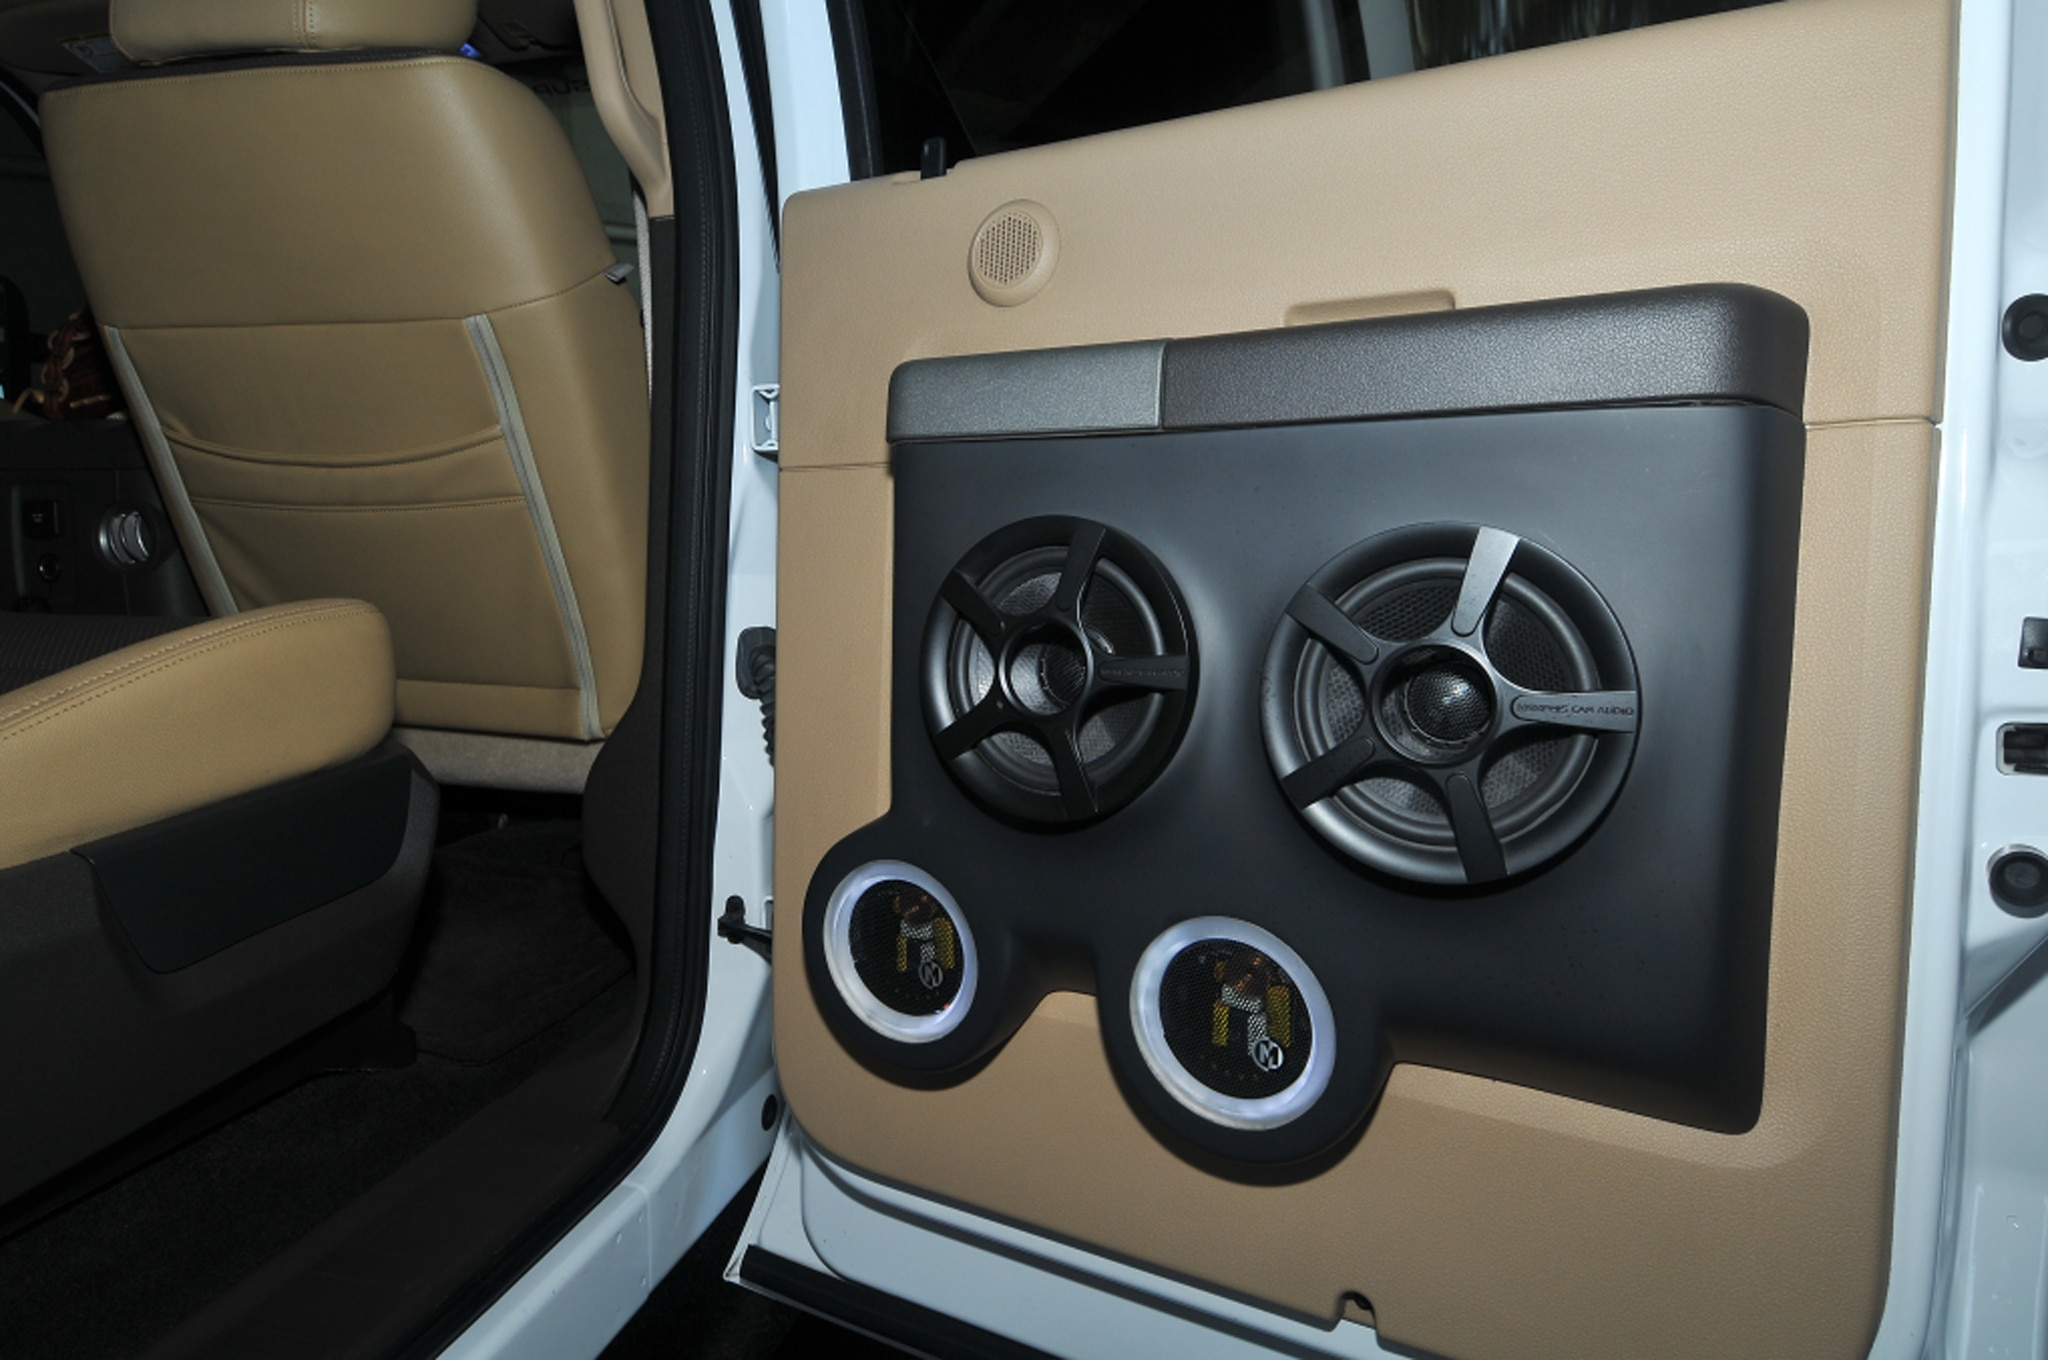 2011 ford f 350 super duty interior door panel [ 2048 x 1360 Pixel ]